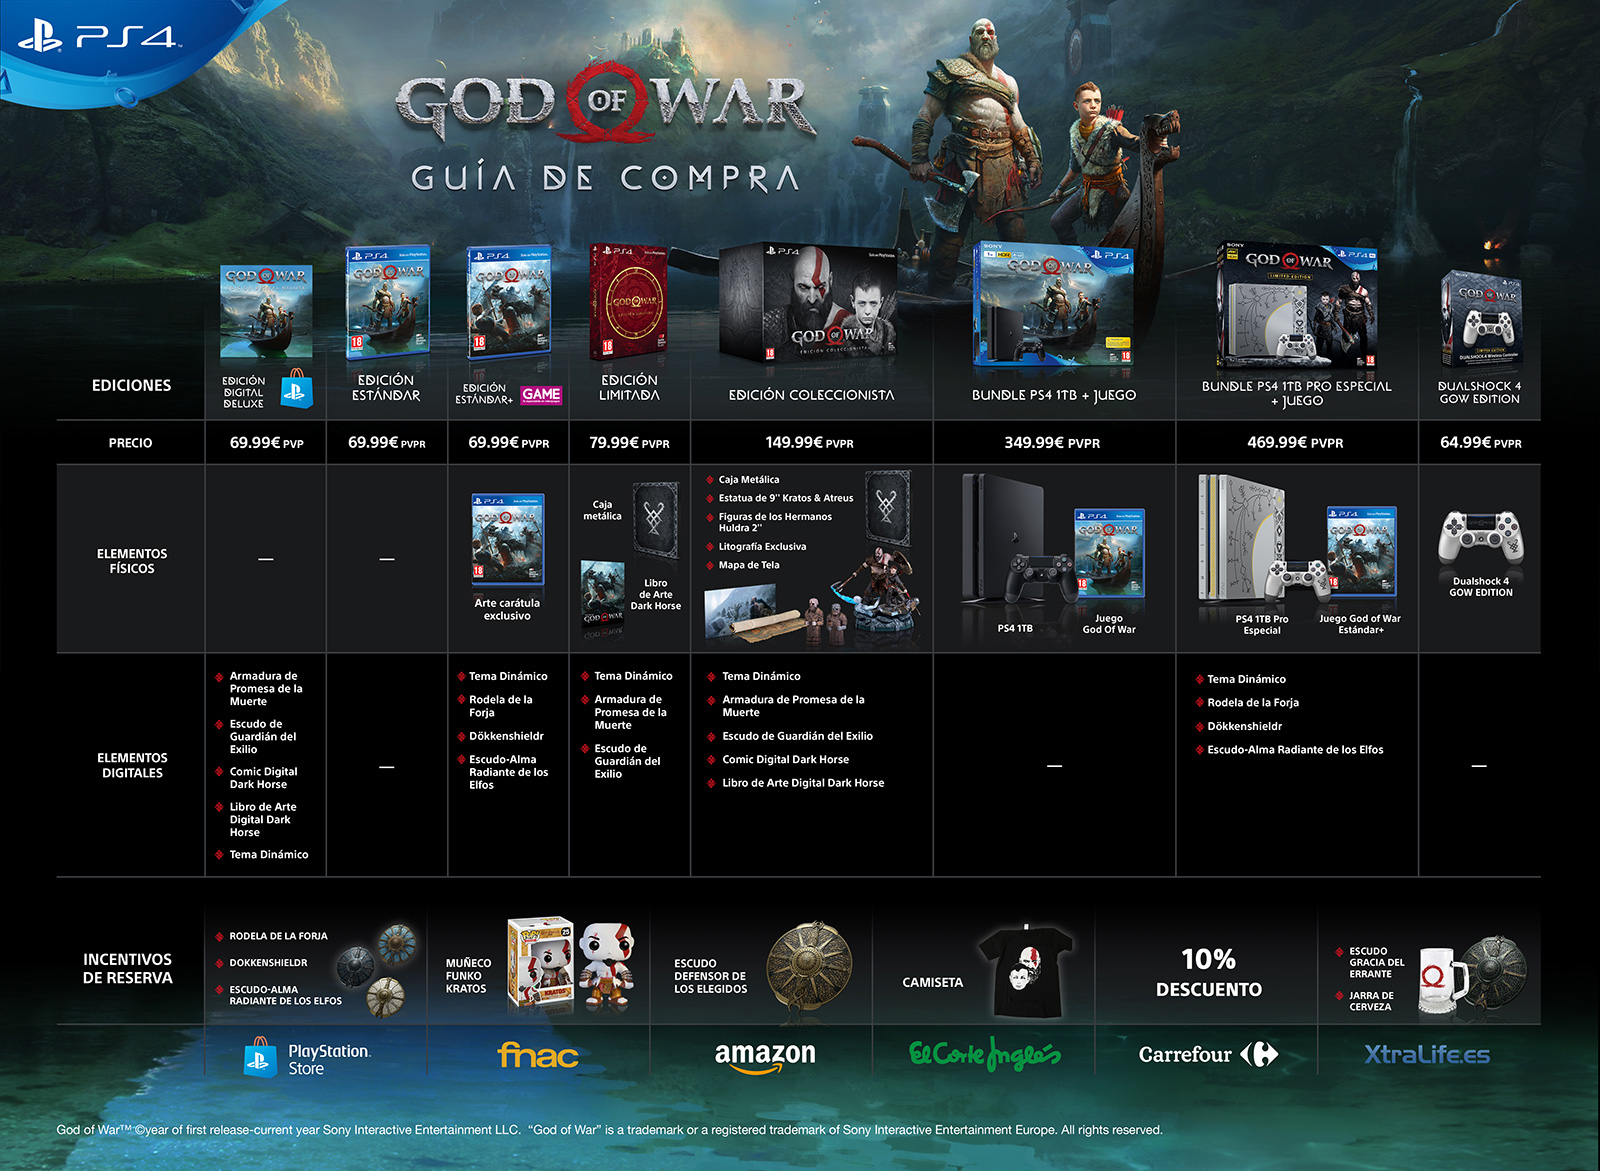 God of War - Guía de compra